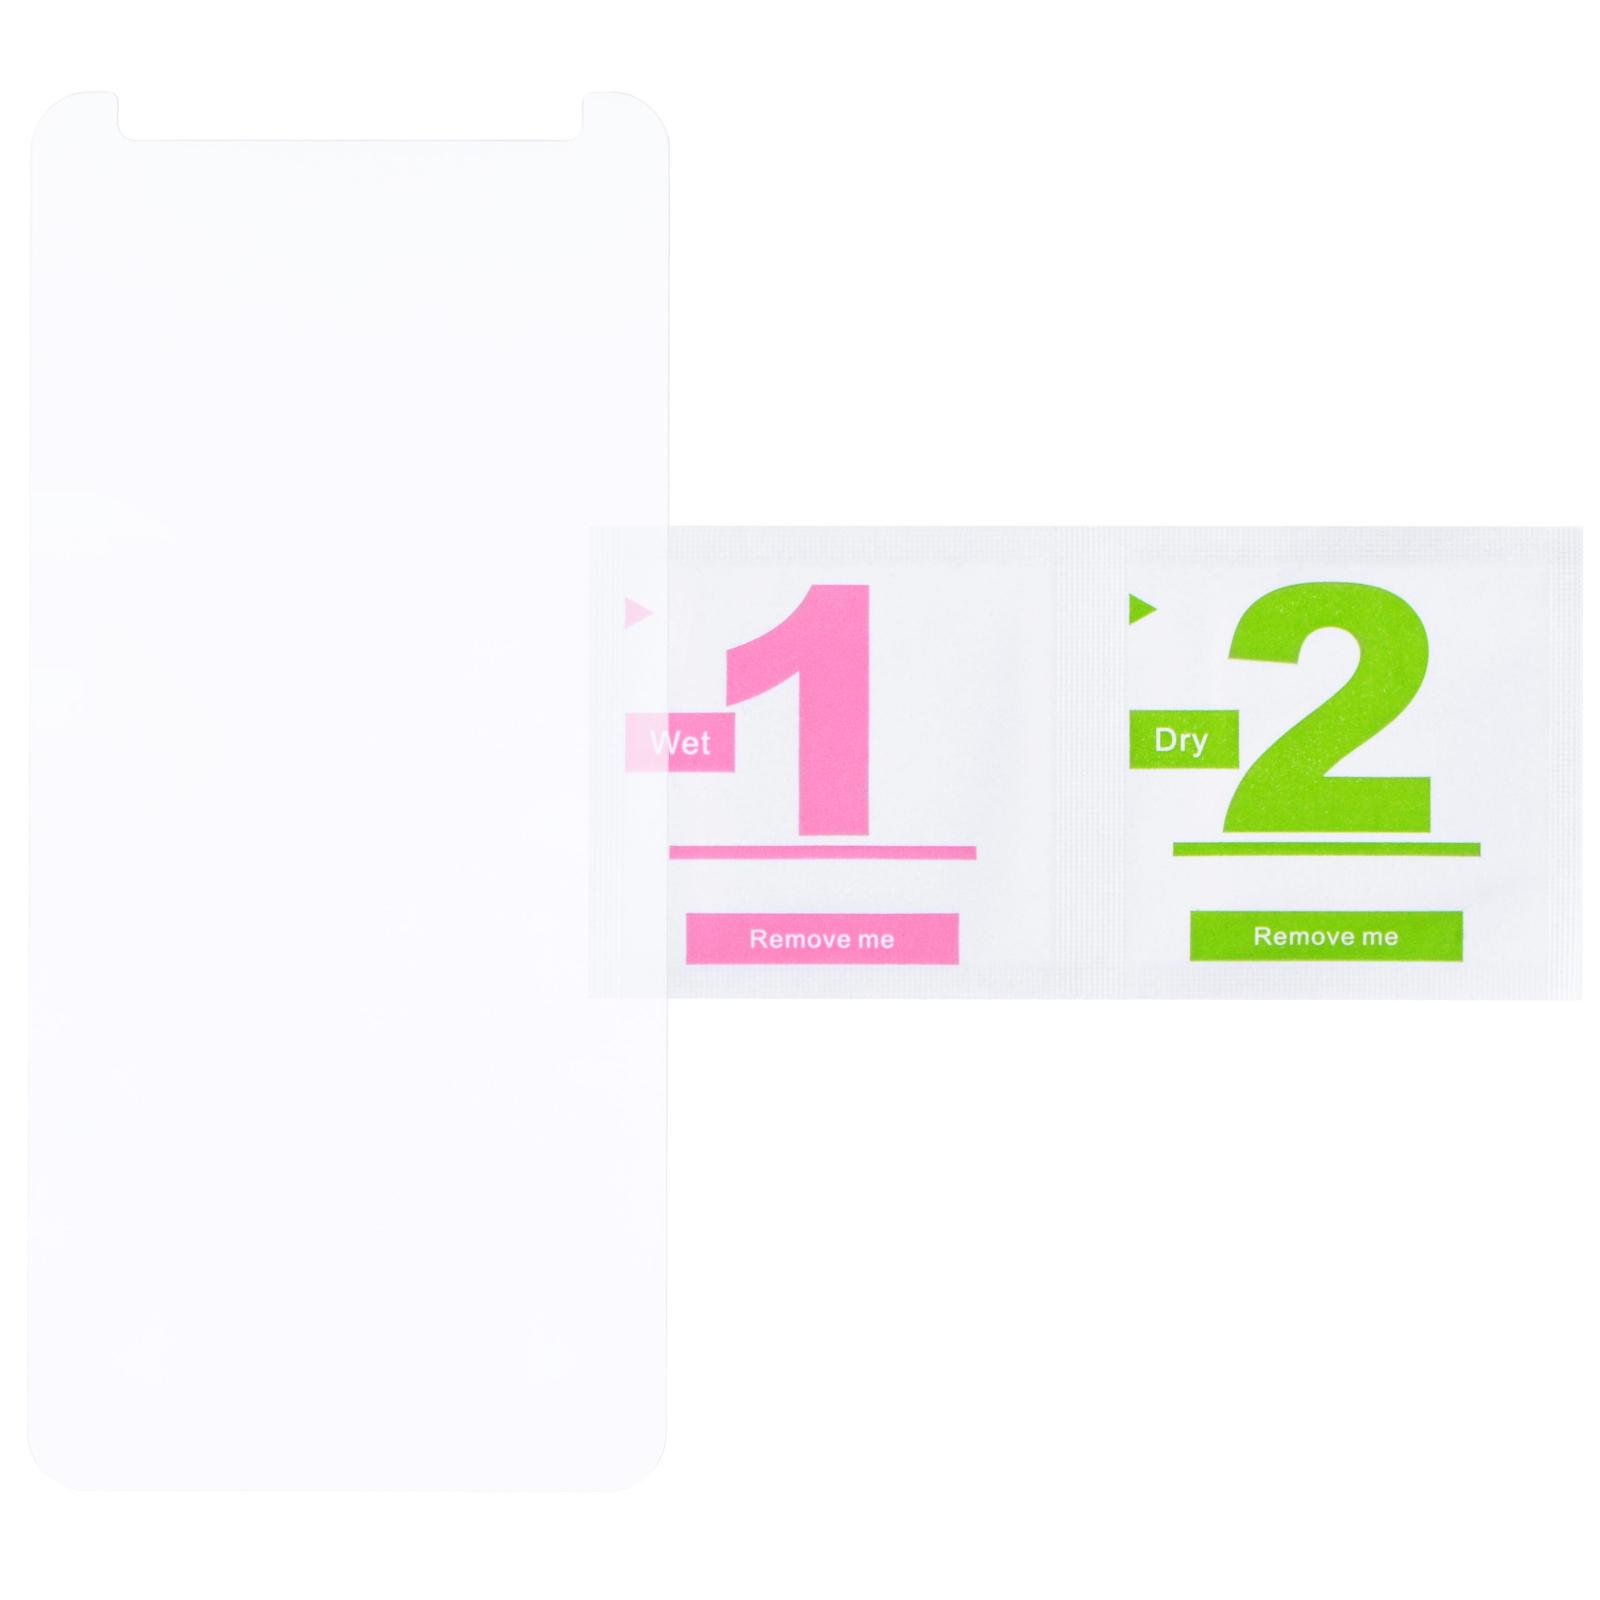 Стекло защитное 2E для Huawei Y7 Prime 2018 2.5D Clear (2E-TGHW-Y7P18-25D) изображение 2